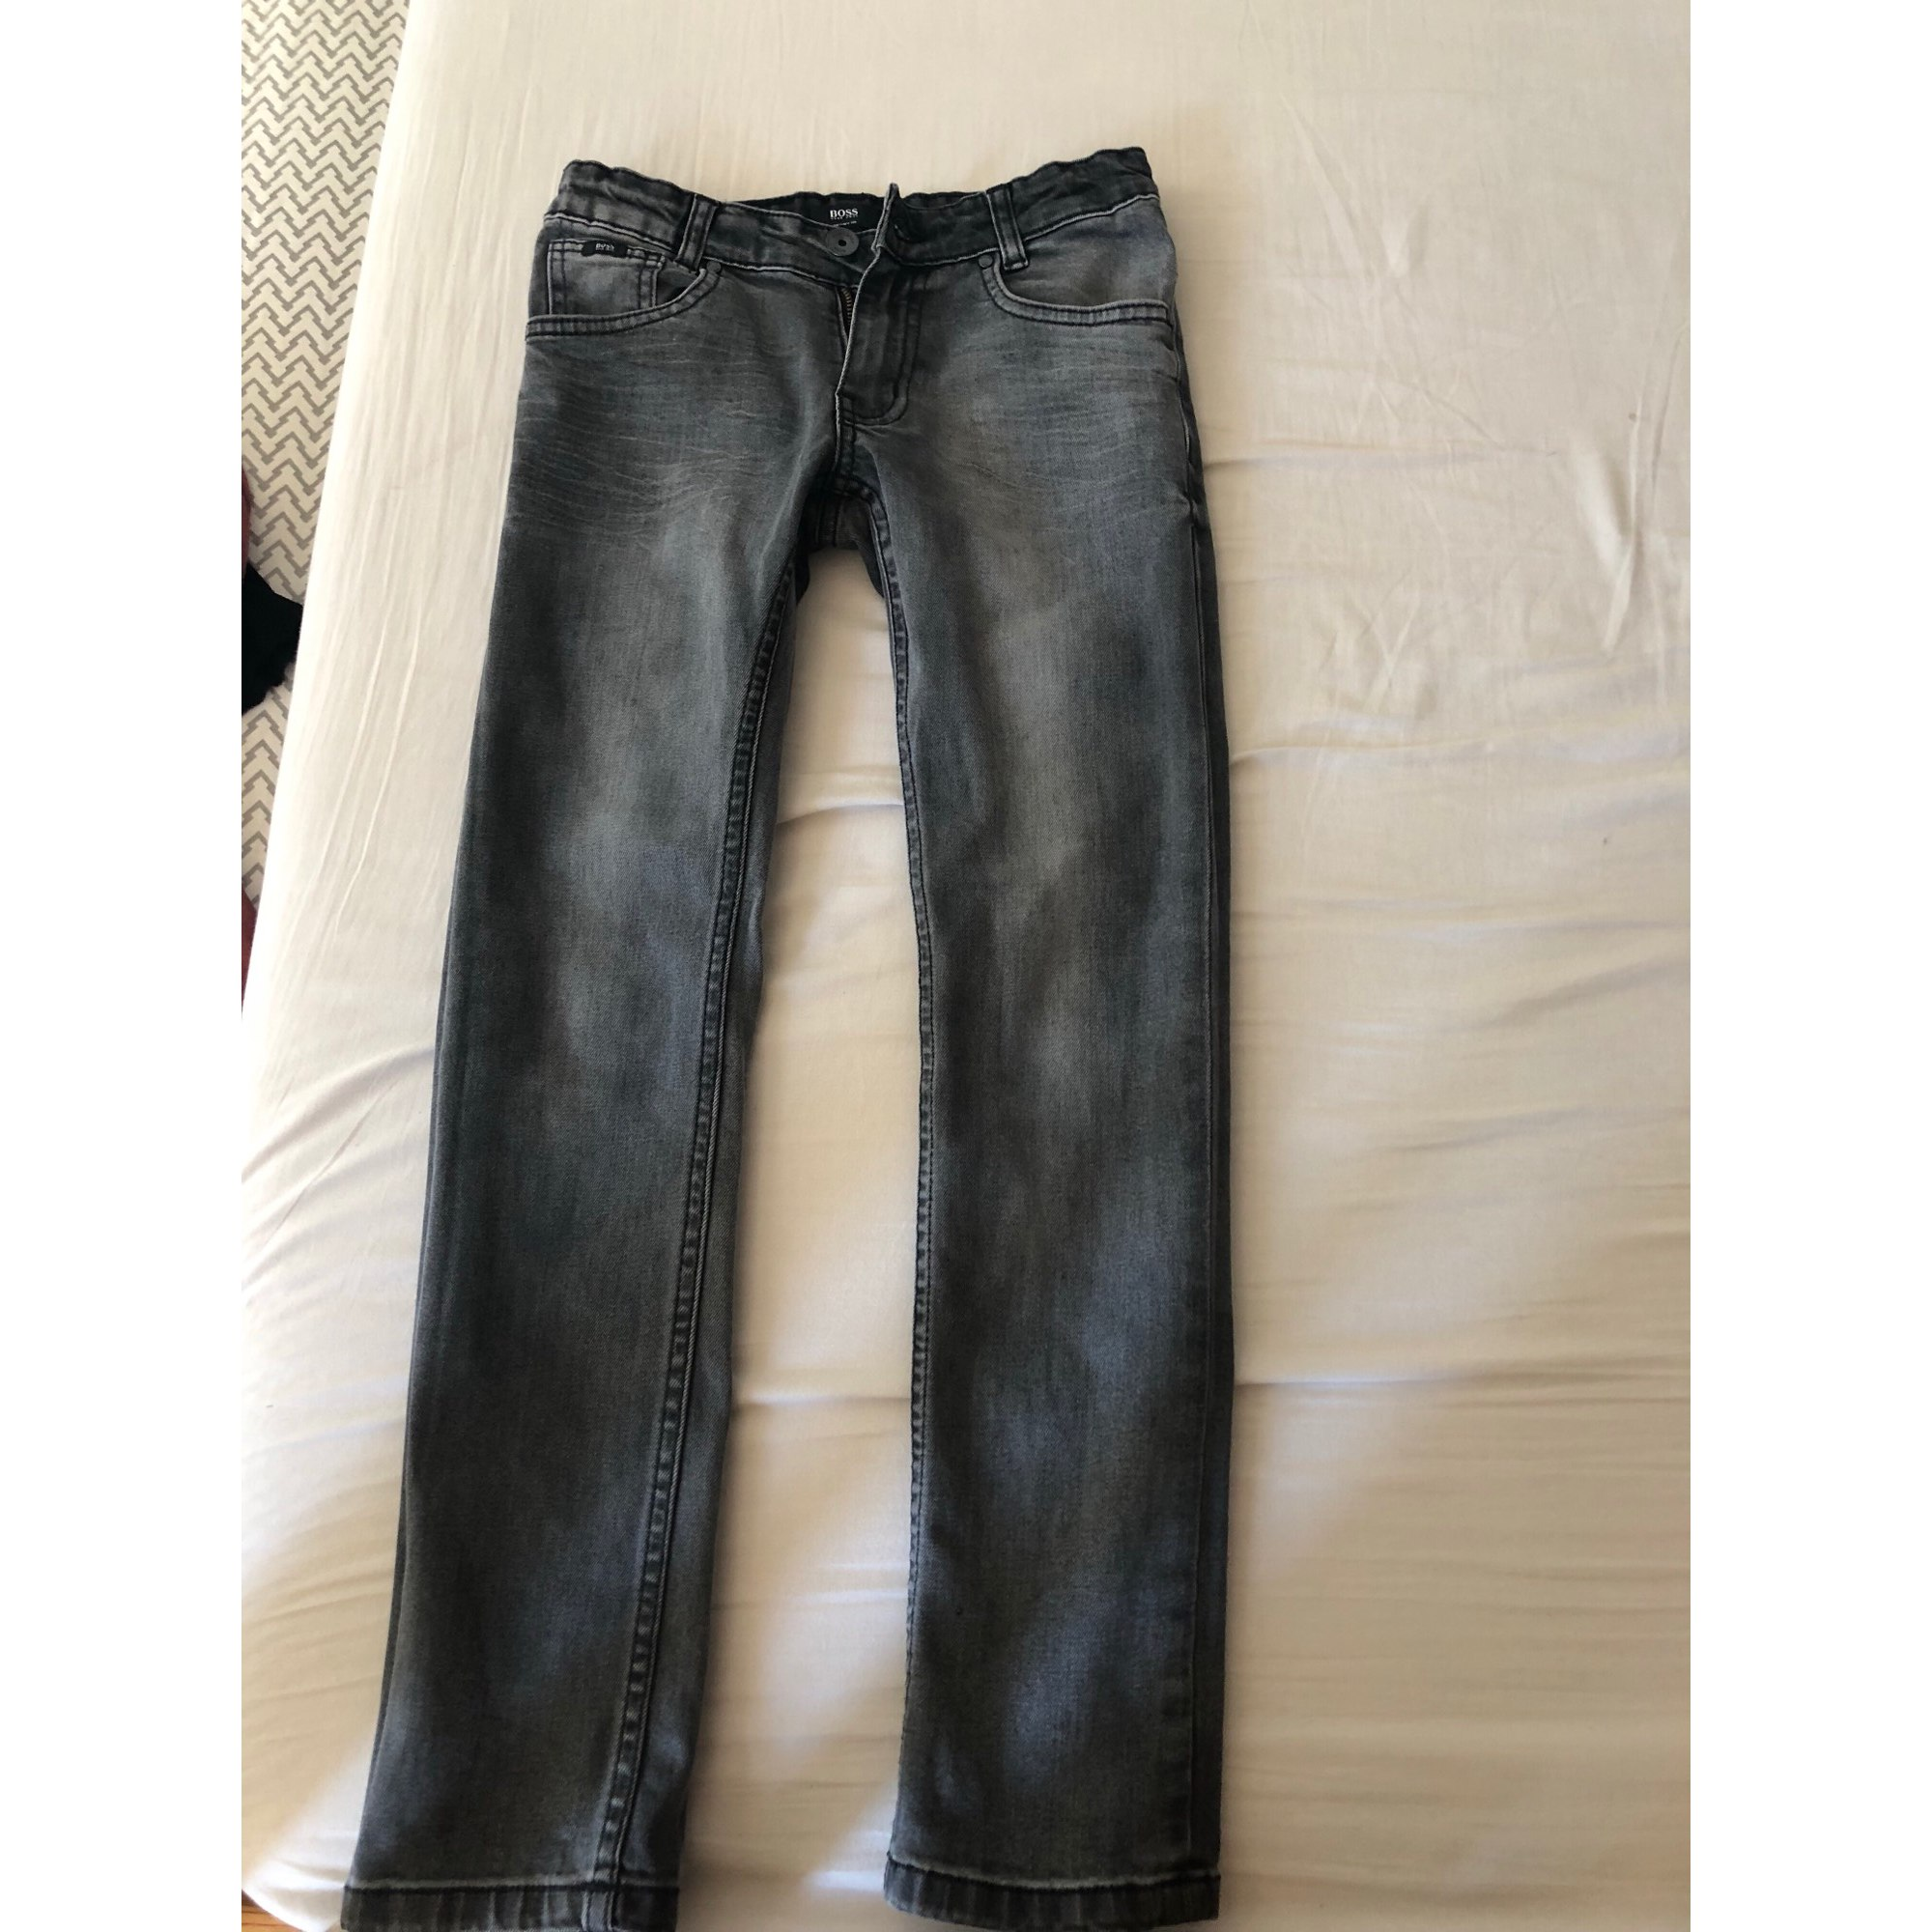 36c799af51 Pantalon HUGO BOSS 9-10 ans gris - 8006024